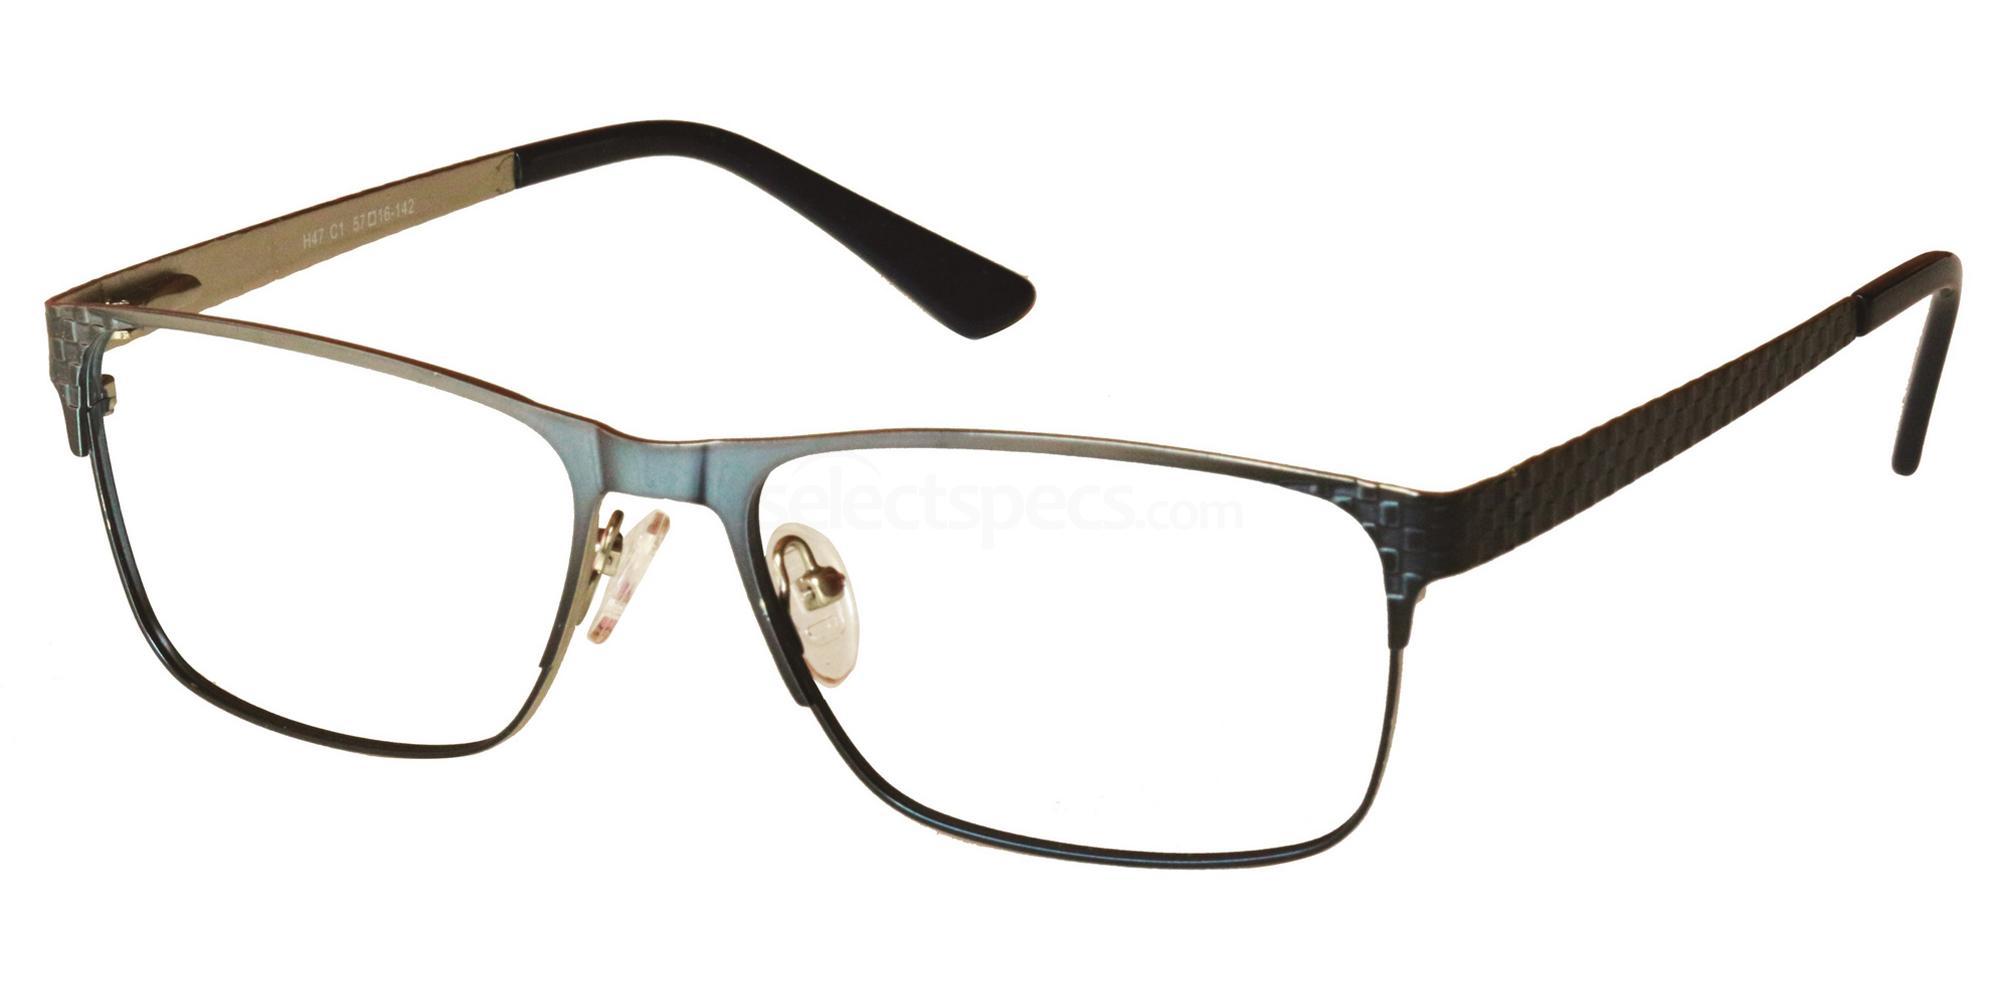 C1 H47 Glasses, Halstrom